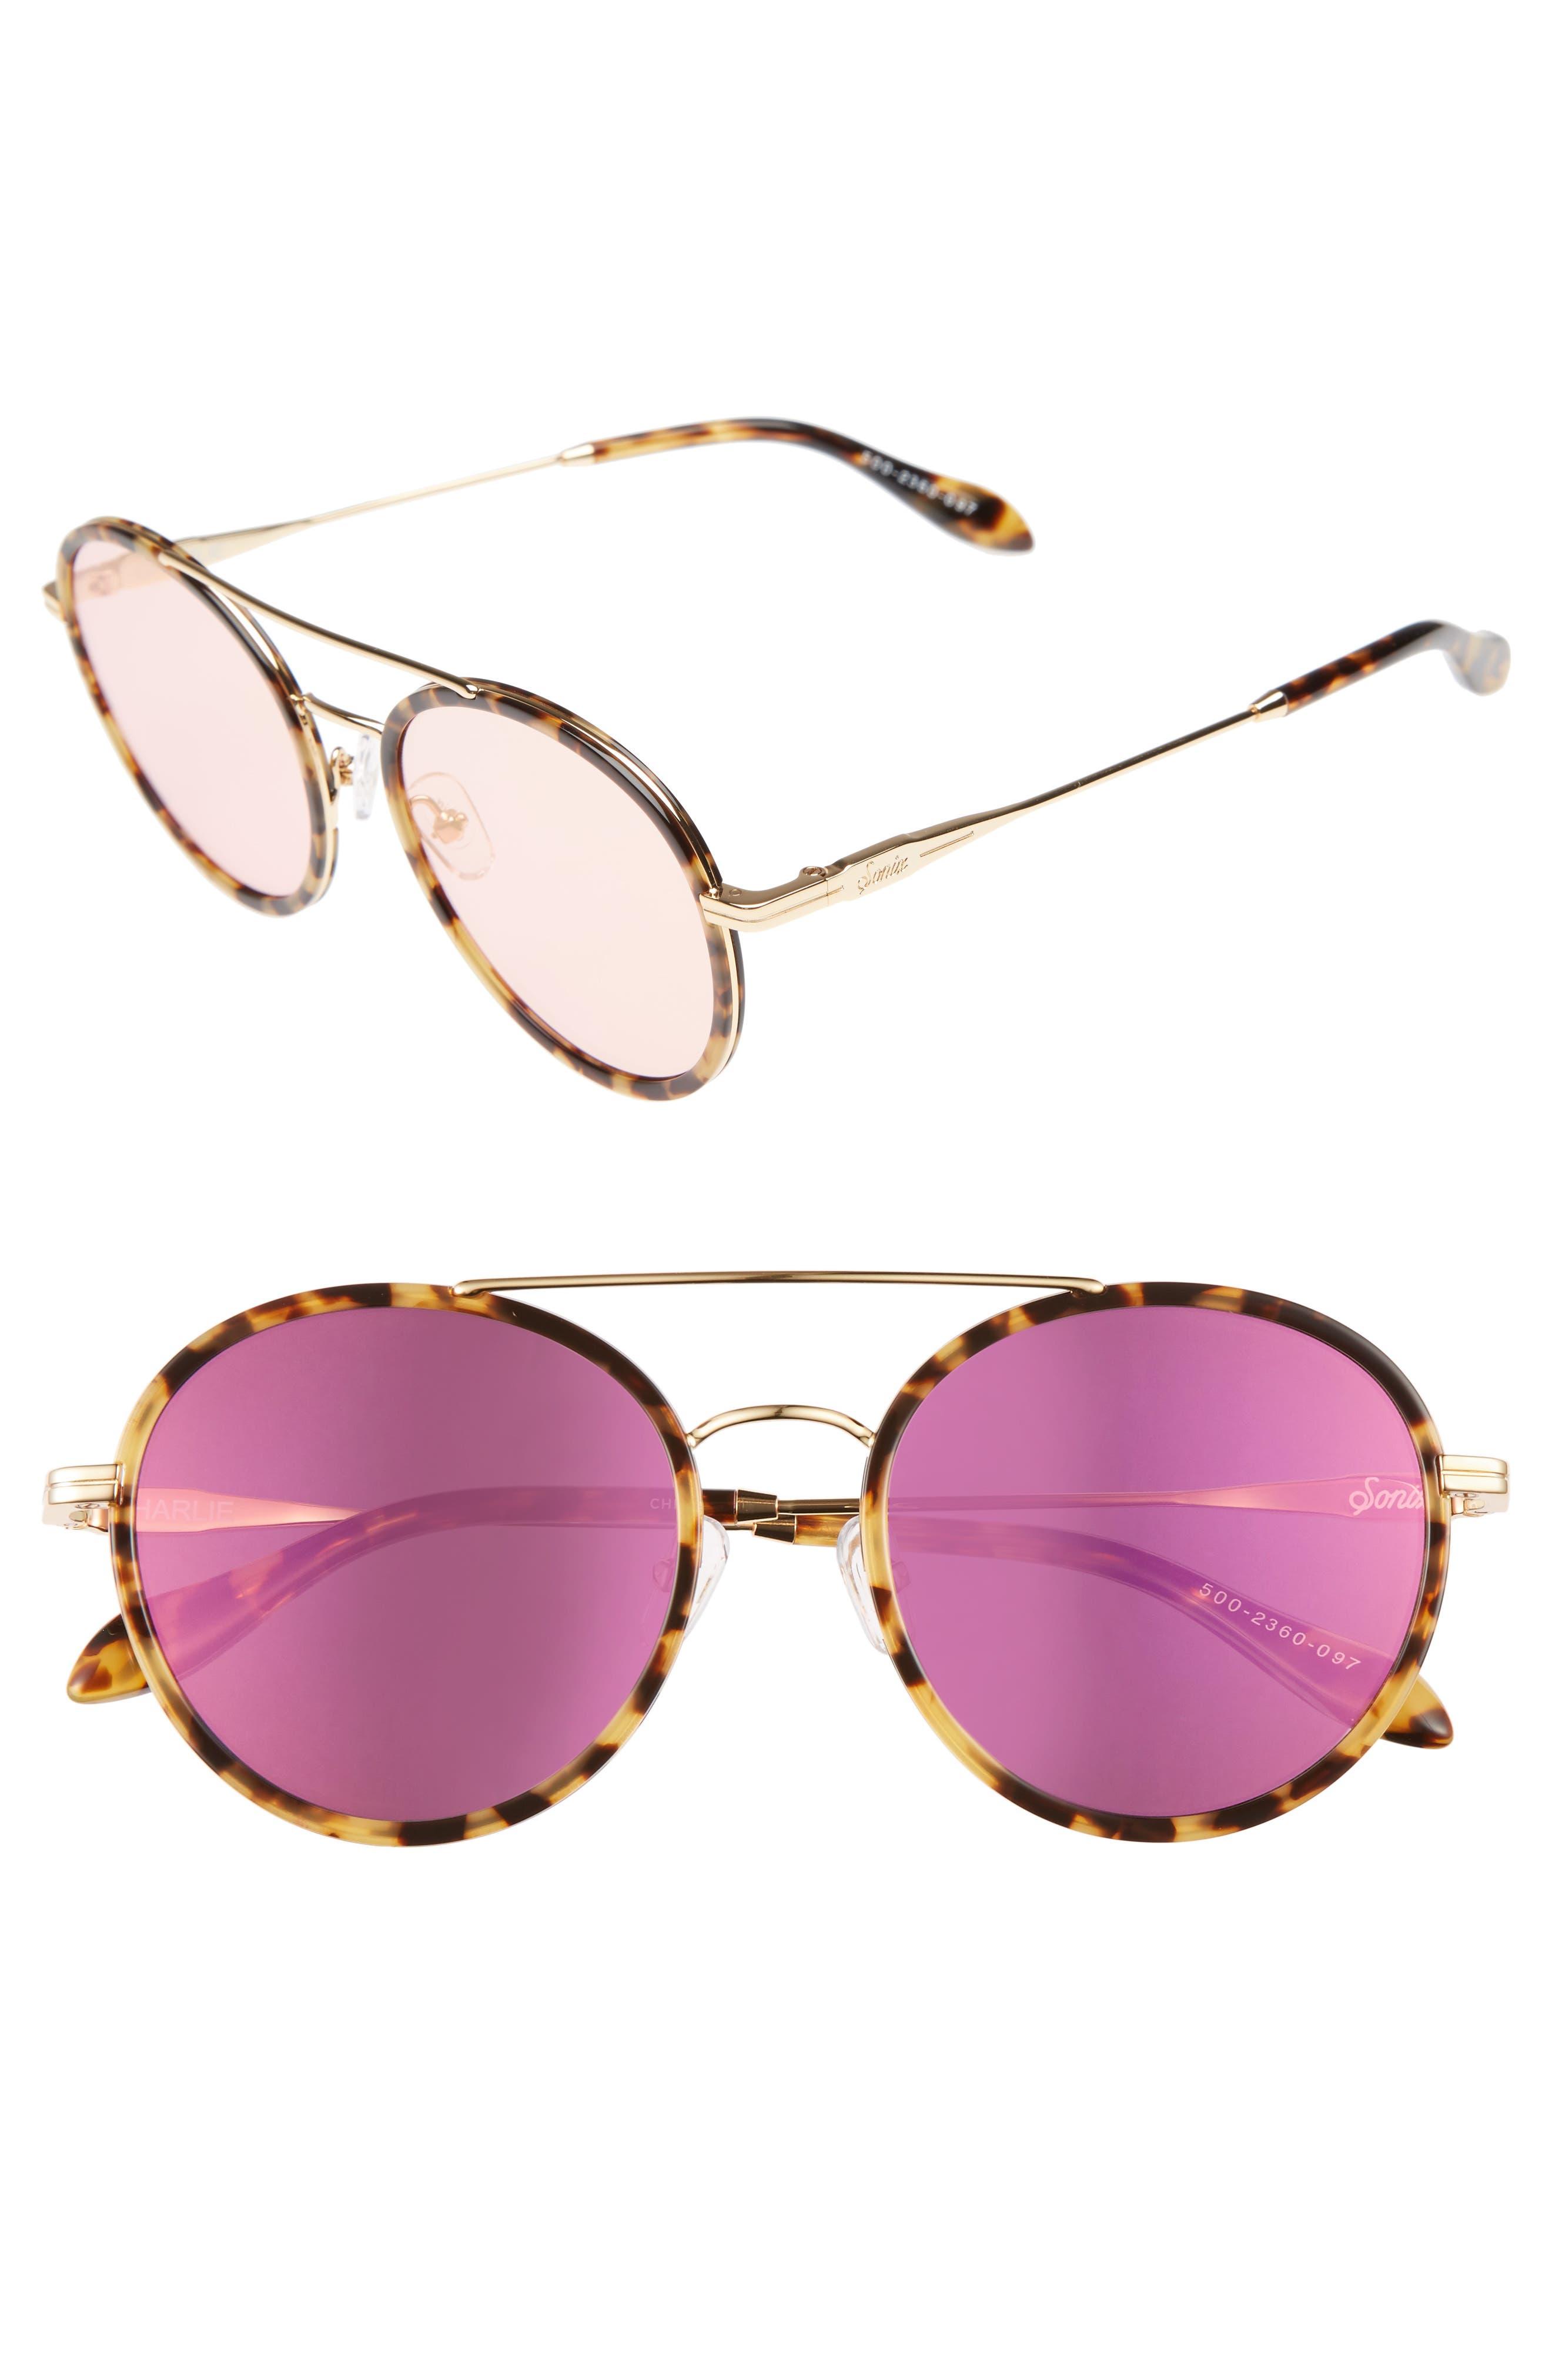 Charli 50mm Mirrored Lens Round Sunglasses,                             Main thumbnail 4, color,